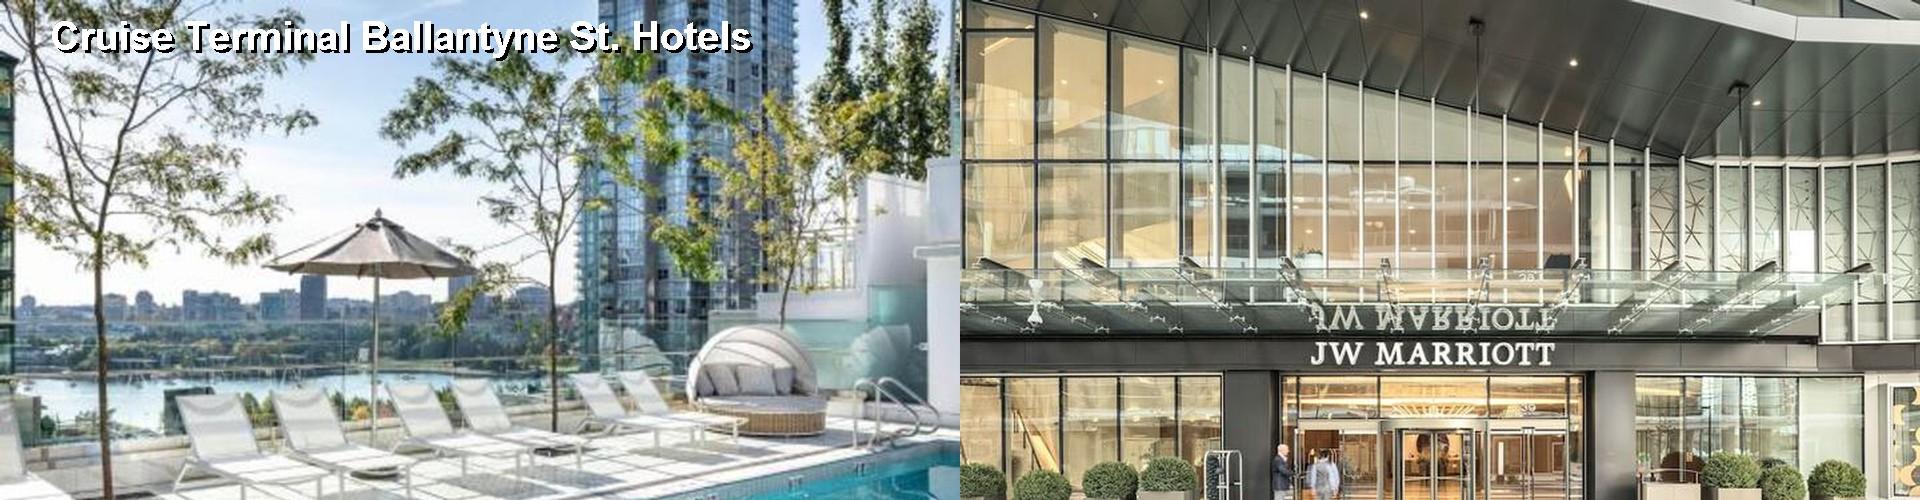 5 Best Hotels Near Cruise Terminal Ballantyne St